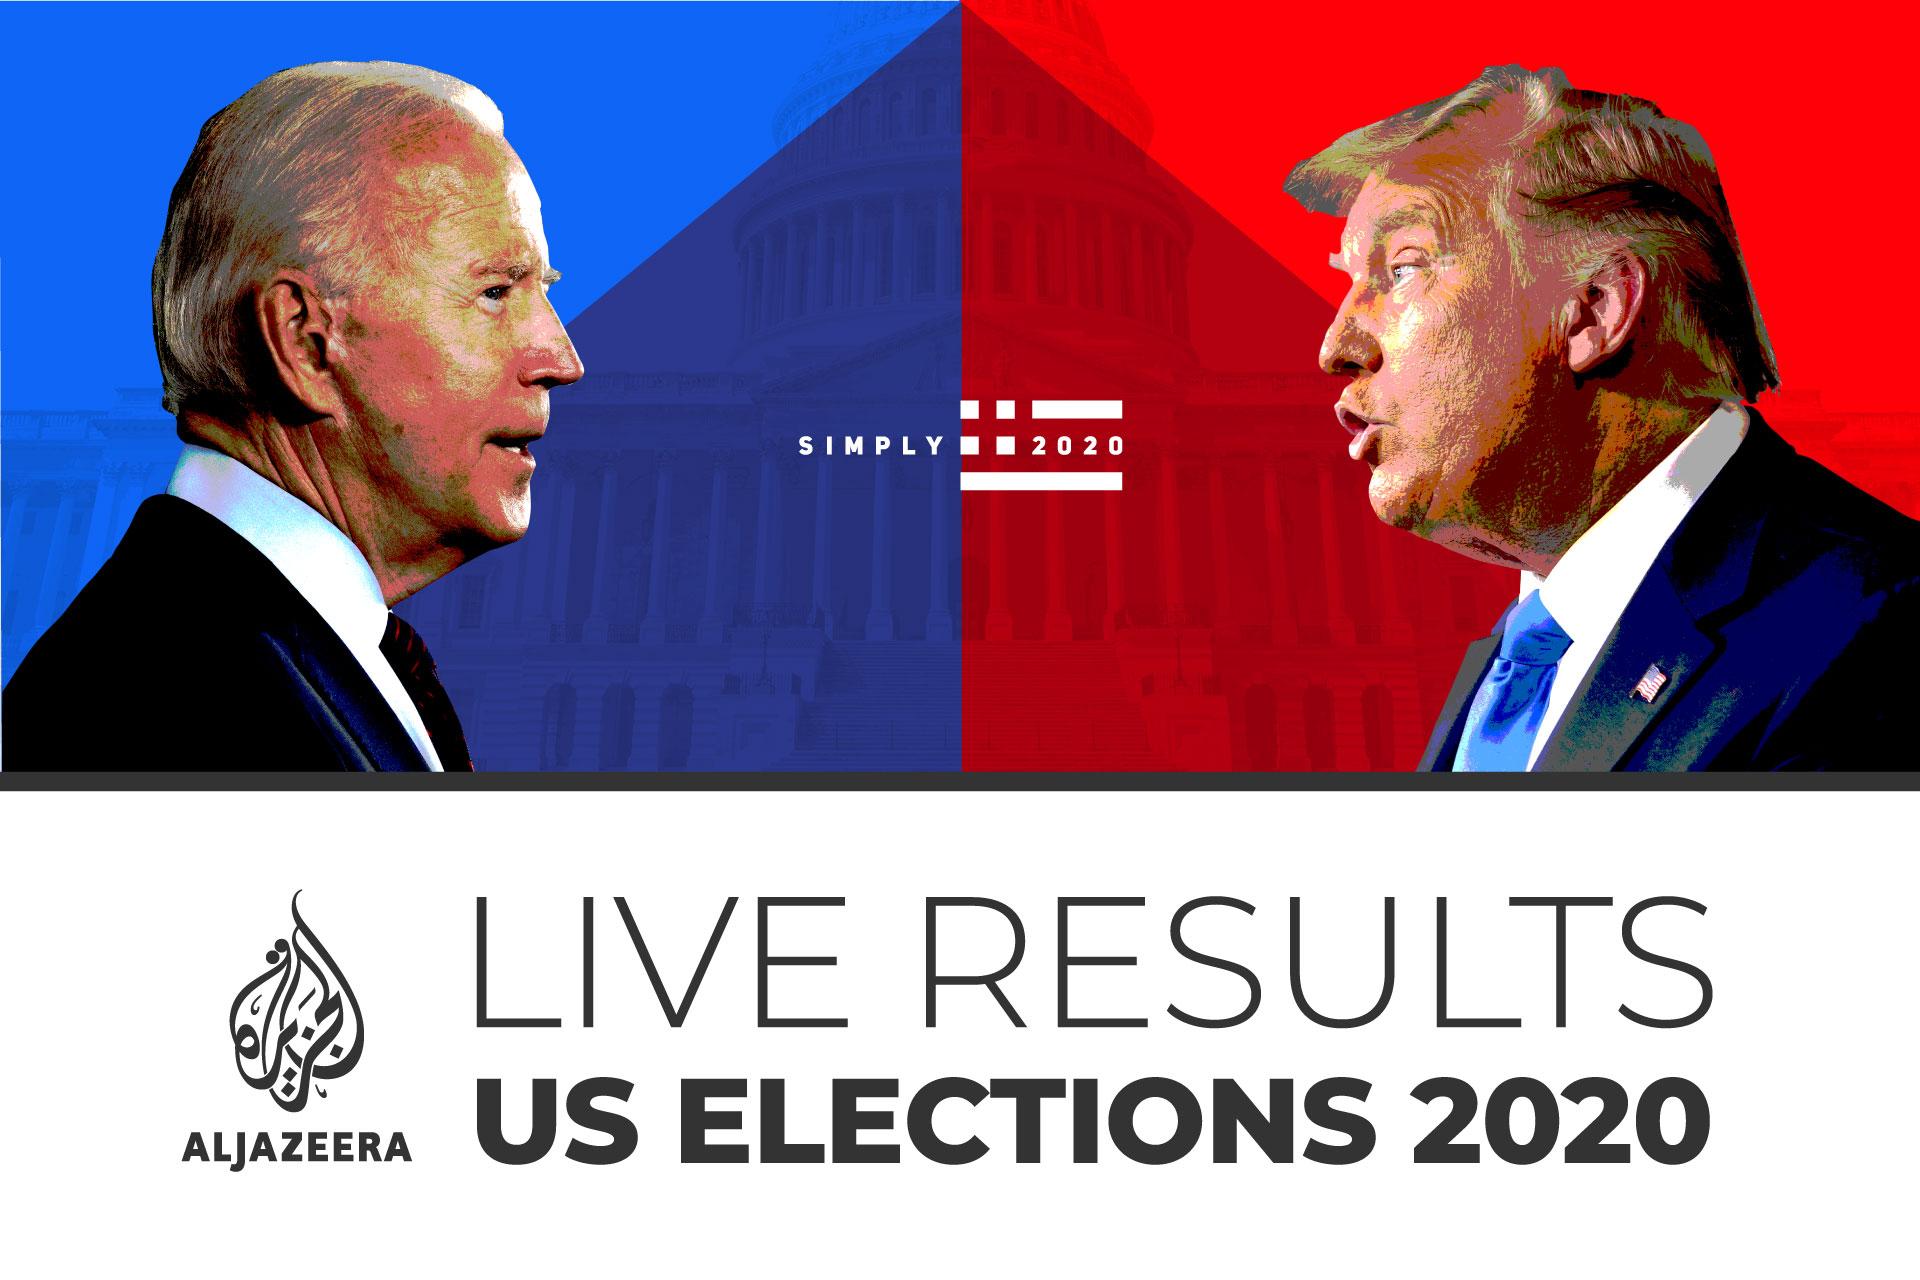 Election usa live president 2020 Live updates: